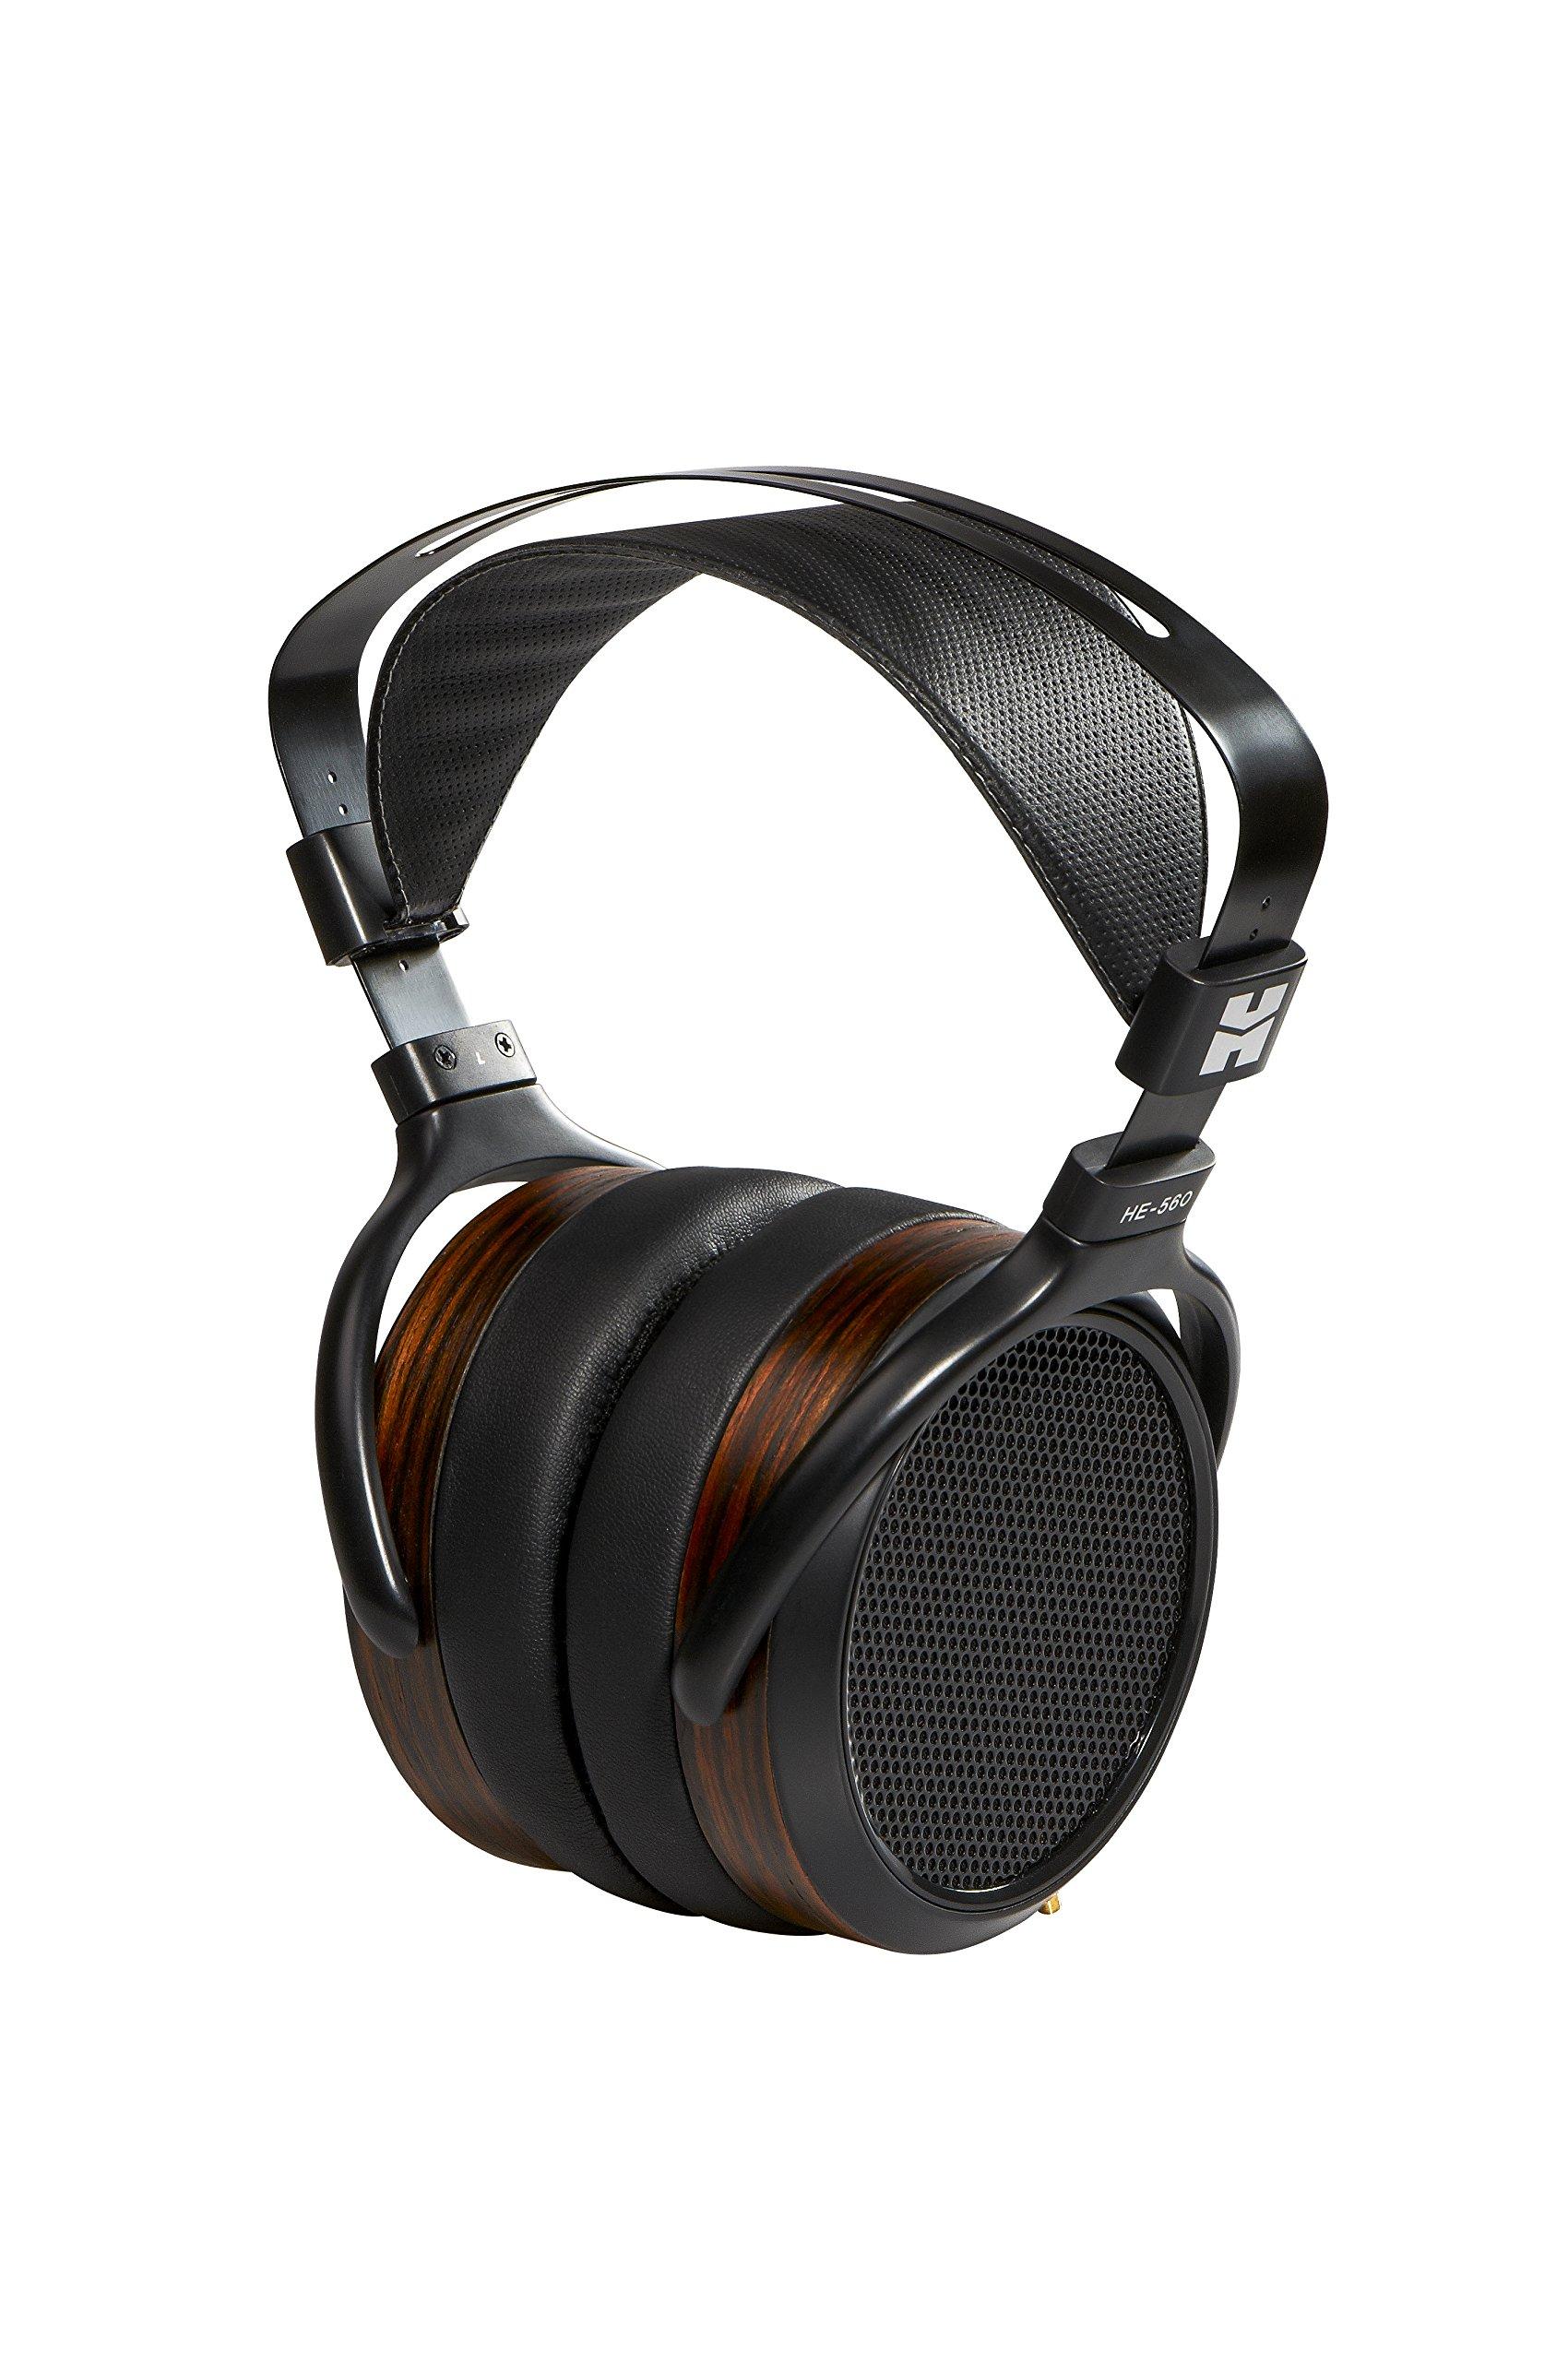 Hifiman HE-560 Full-Size Planar Magnetic Over-Ear Headphones (Black/Woodgrain) by HIFIMAN